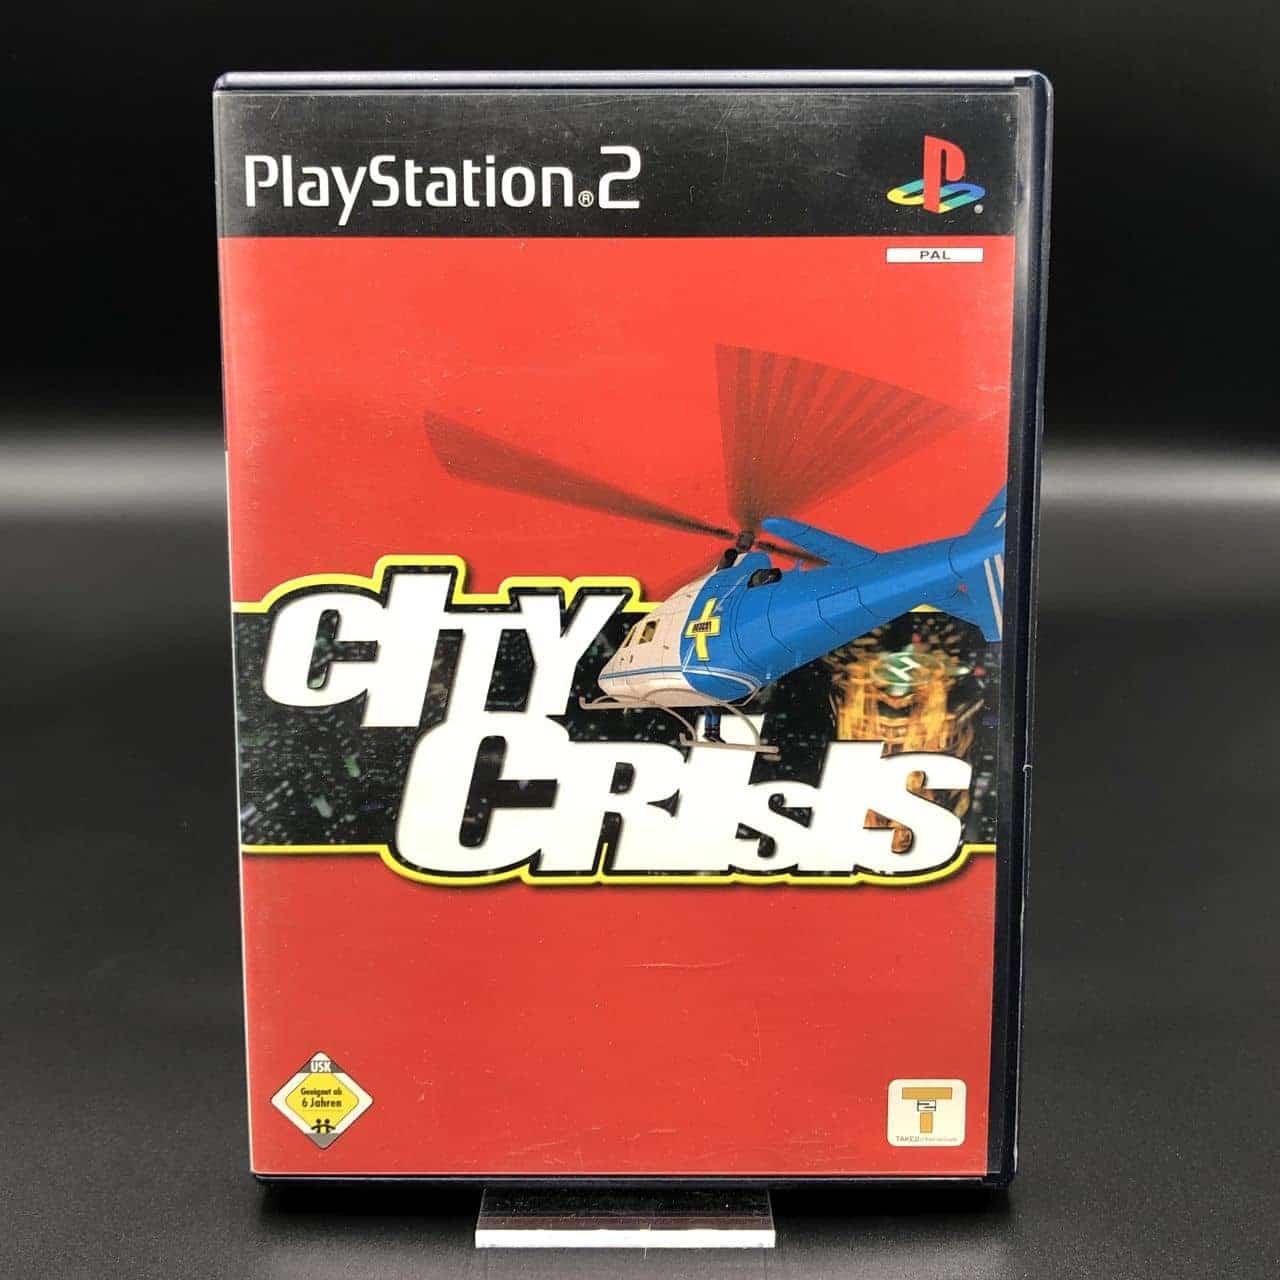 PS2 City Crisis (Komplett) (Gebrauchsspuren) Sony PlayStation 2